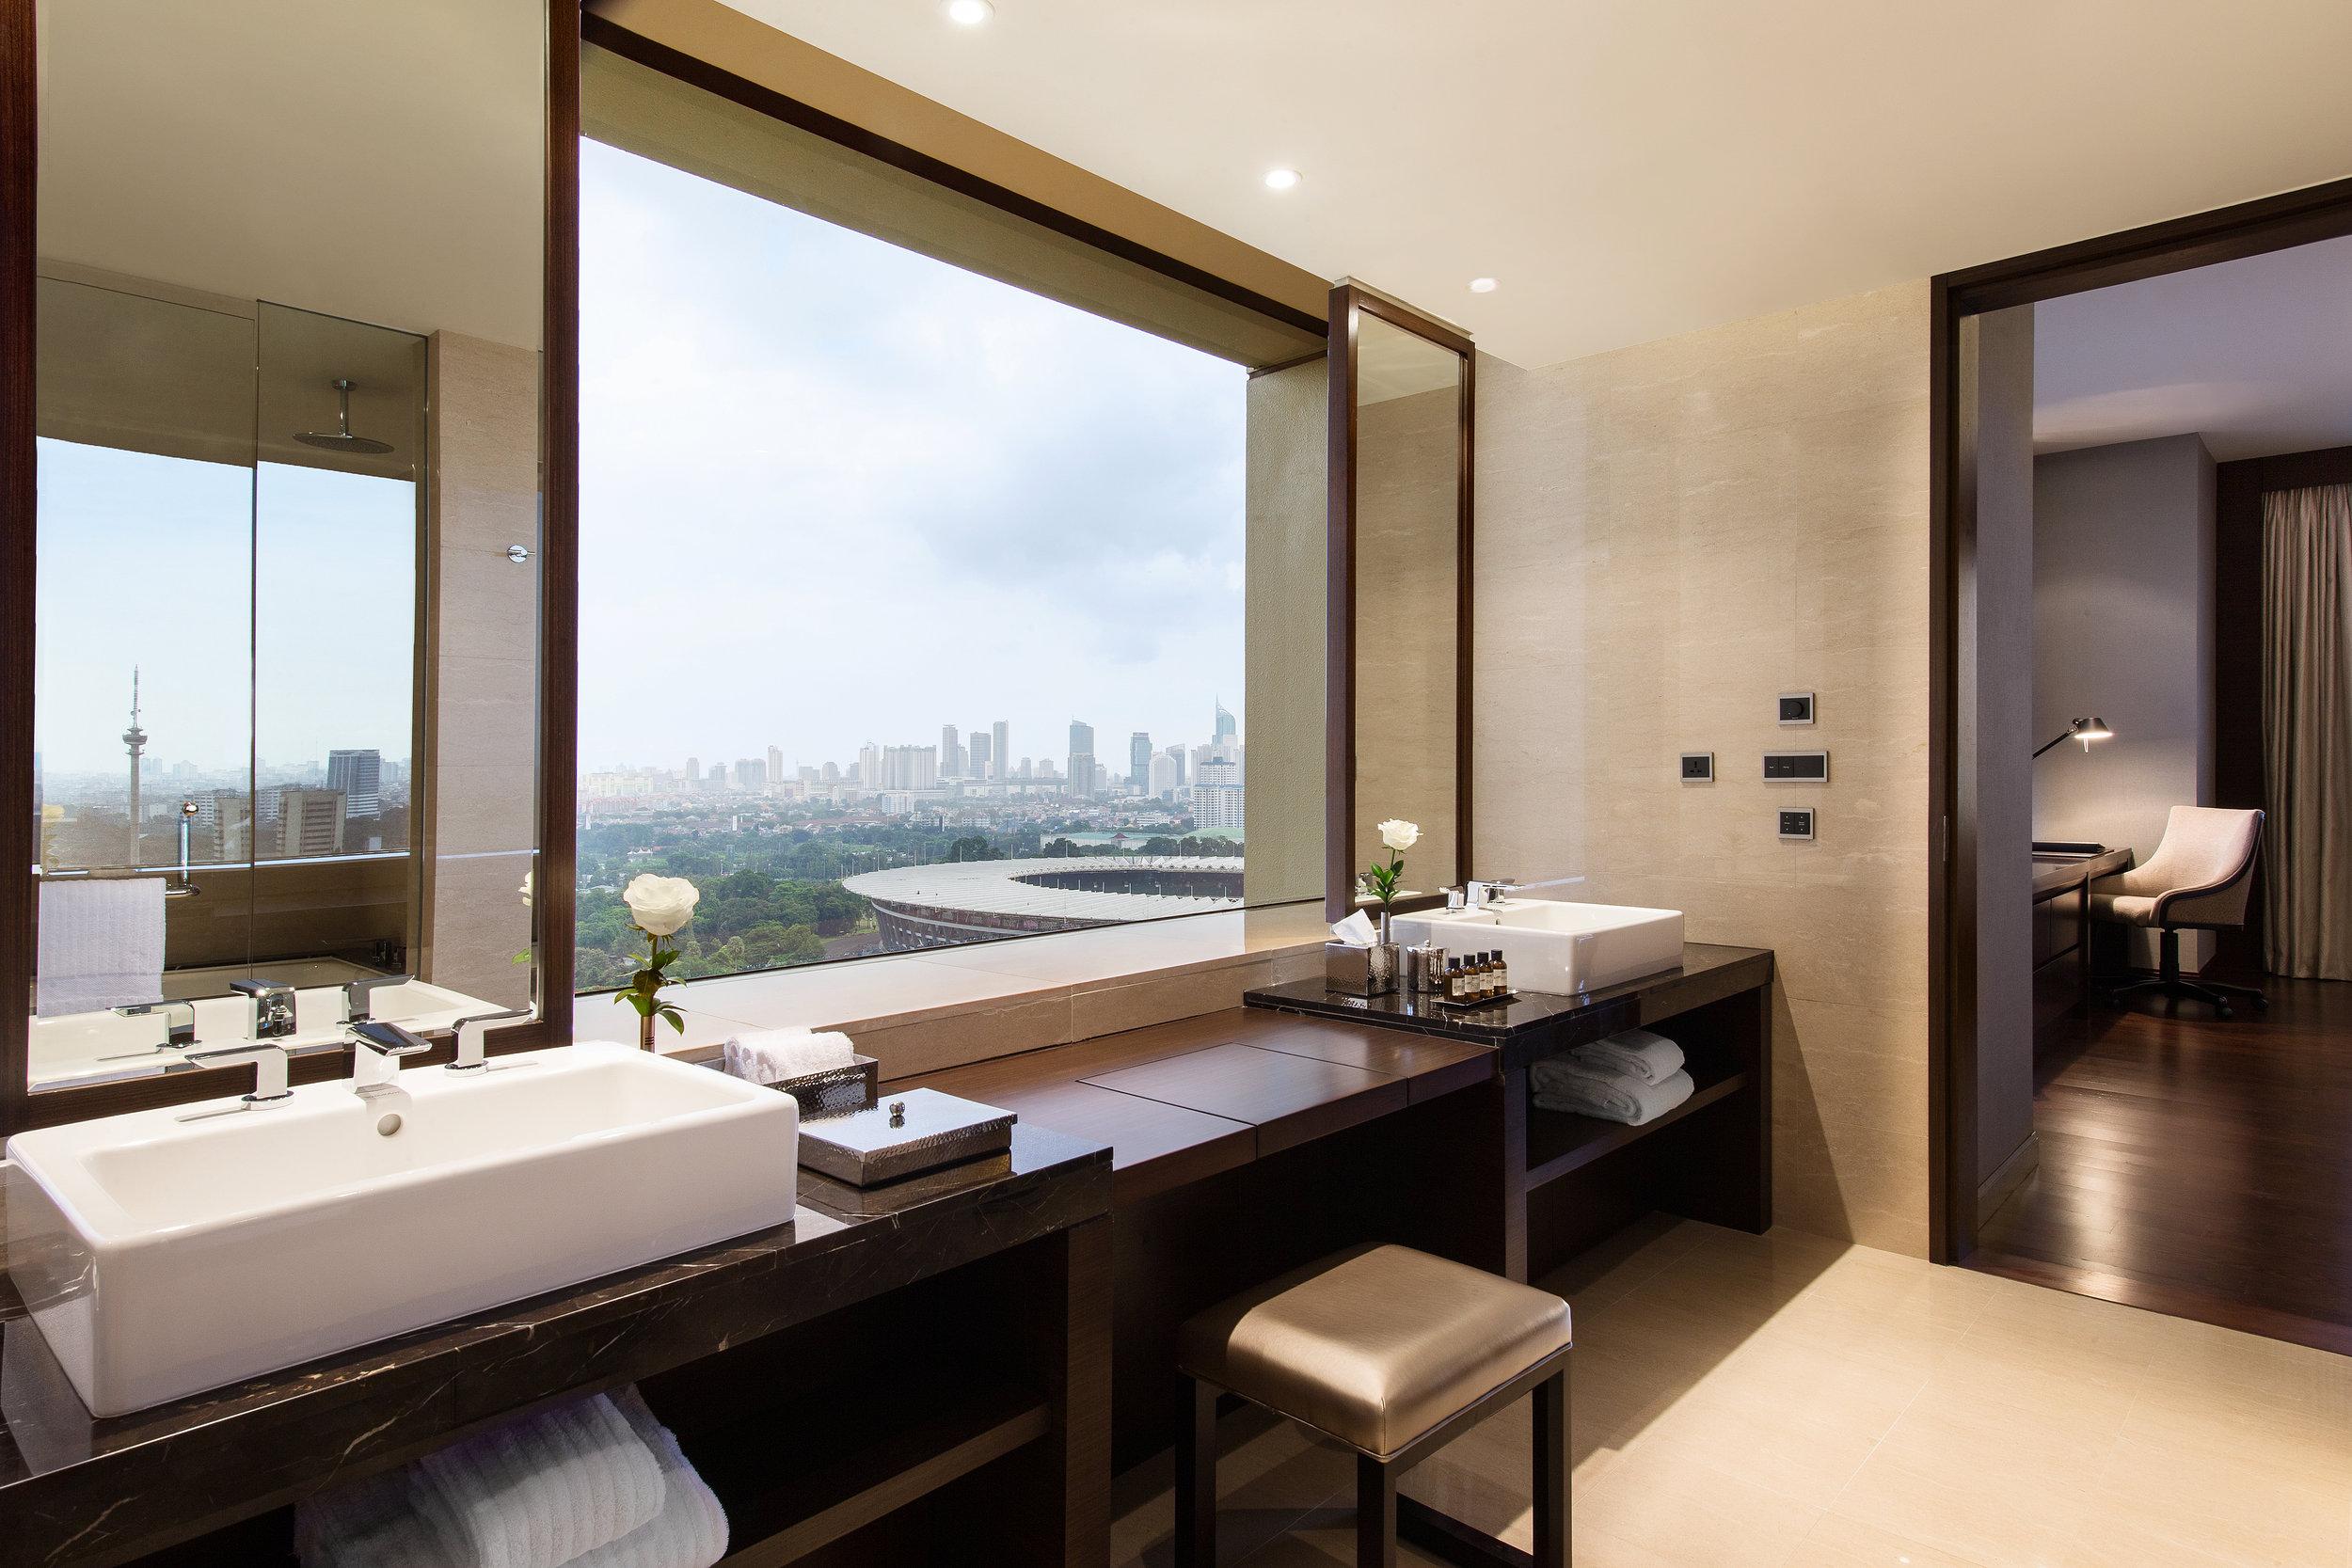 1802_gold_One_bathroom.JPG